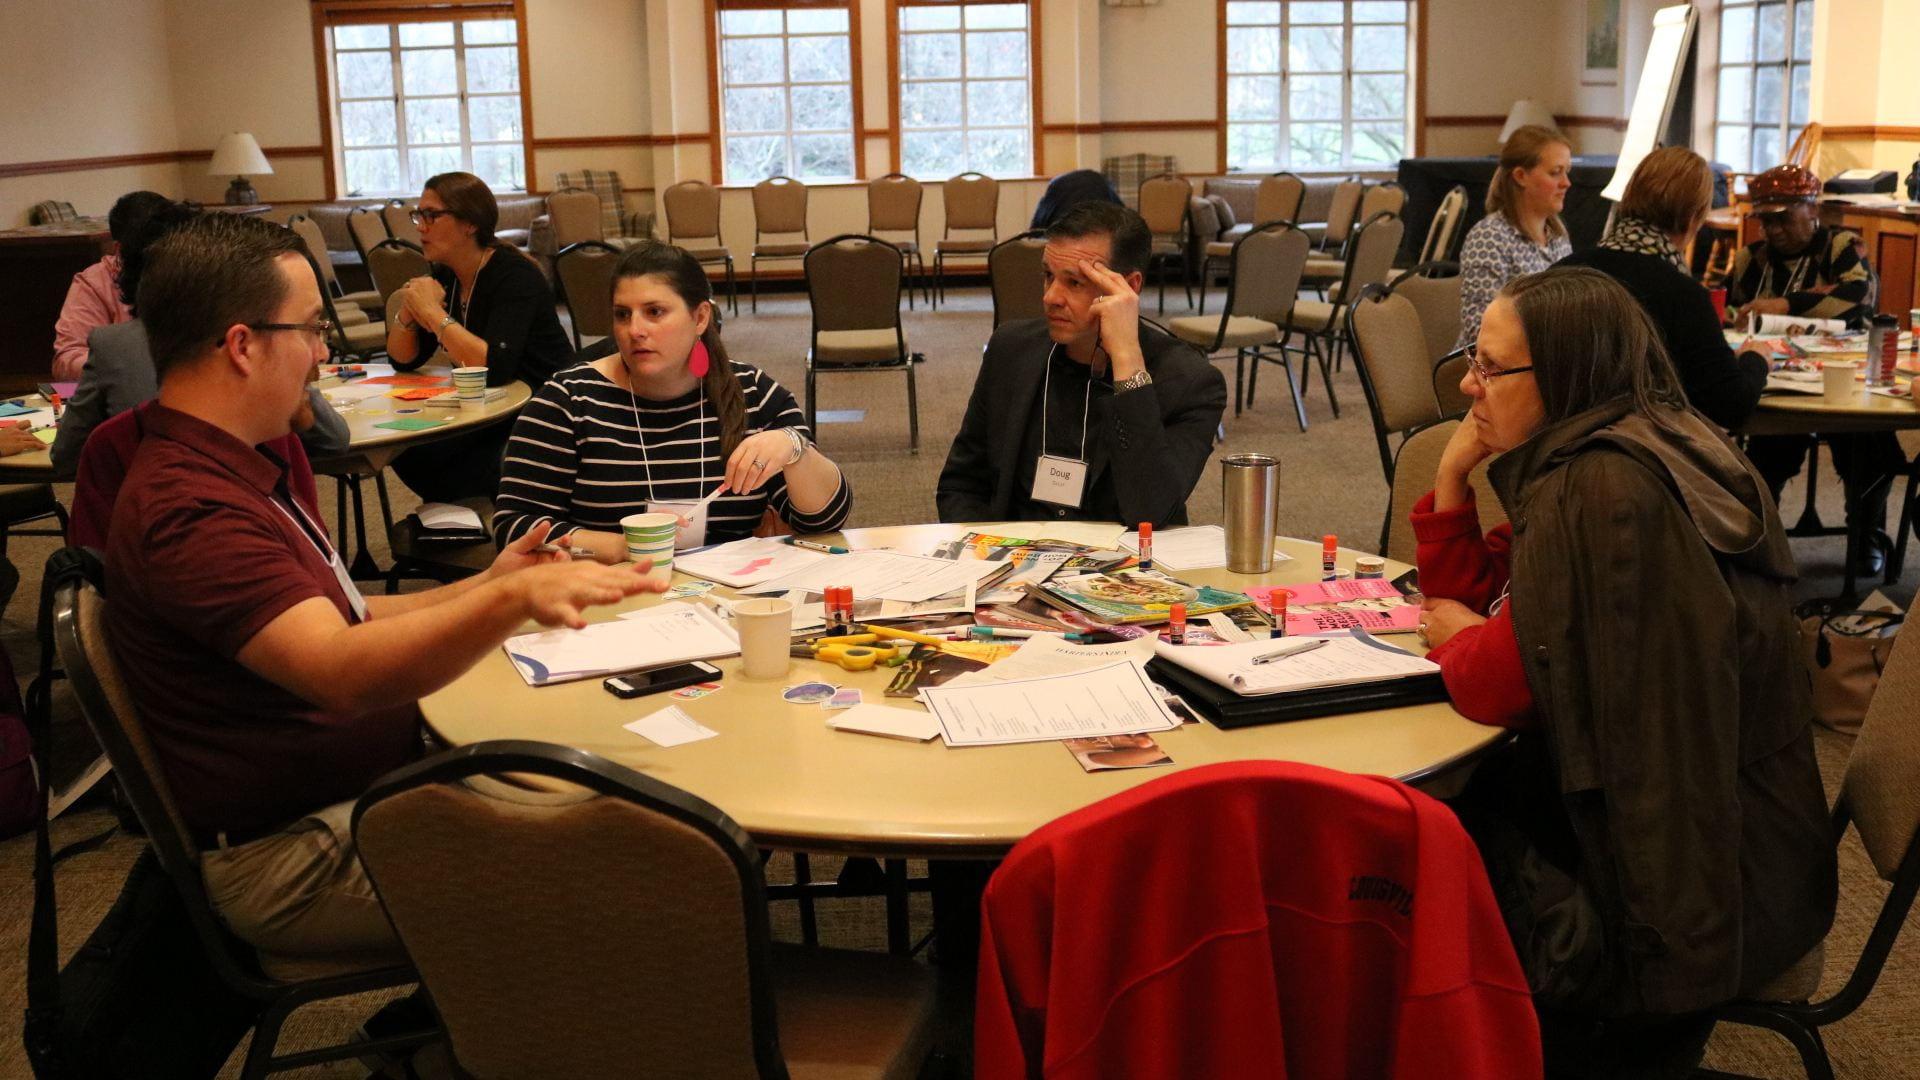 Participants discuss workshop materials.